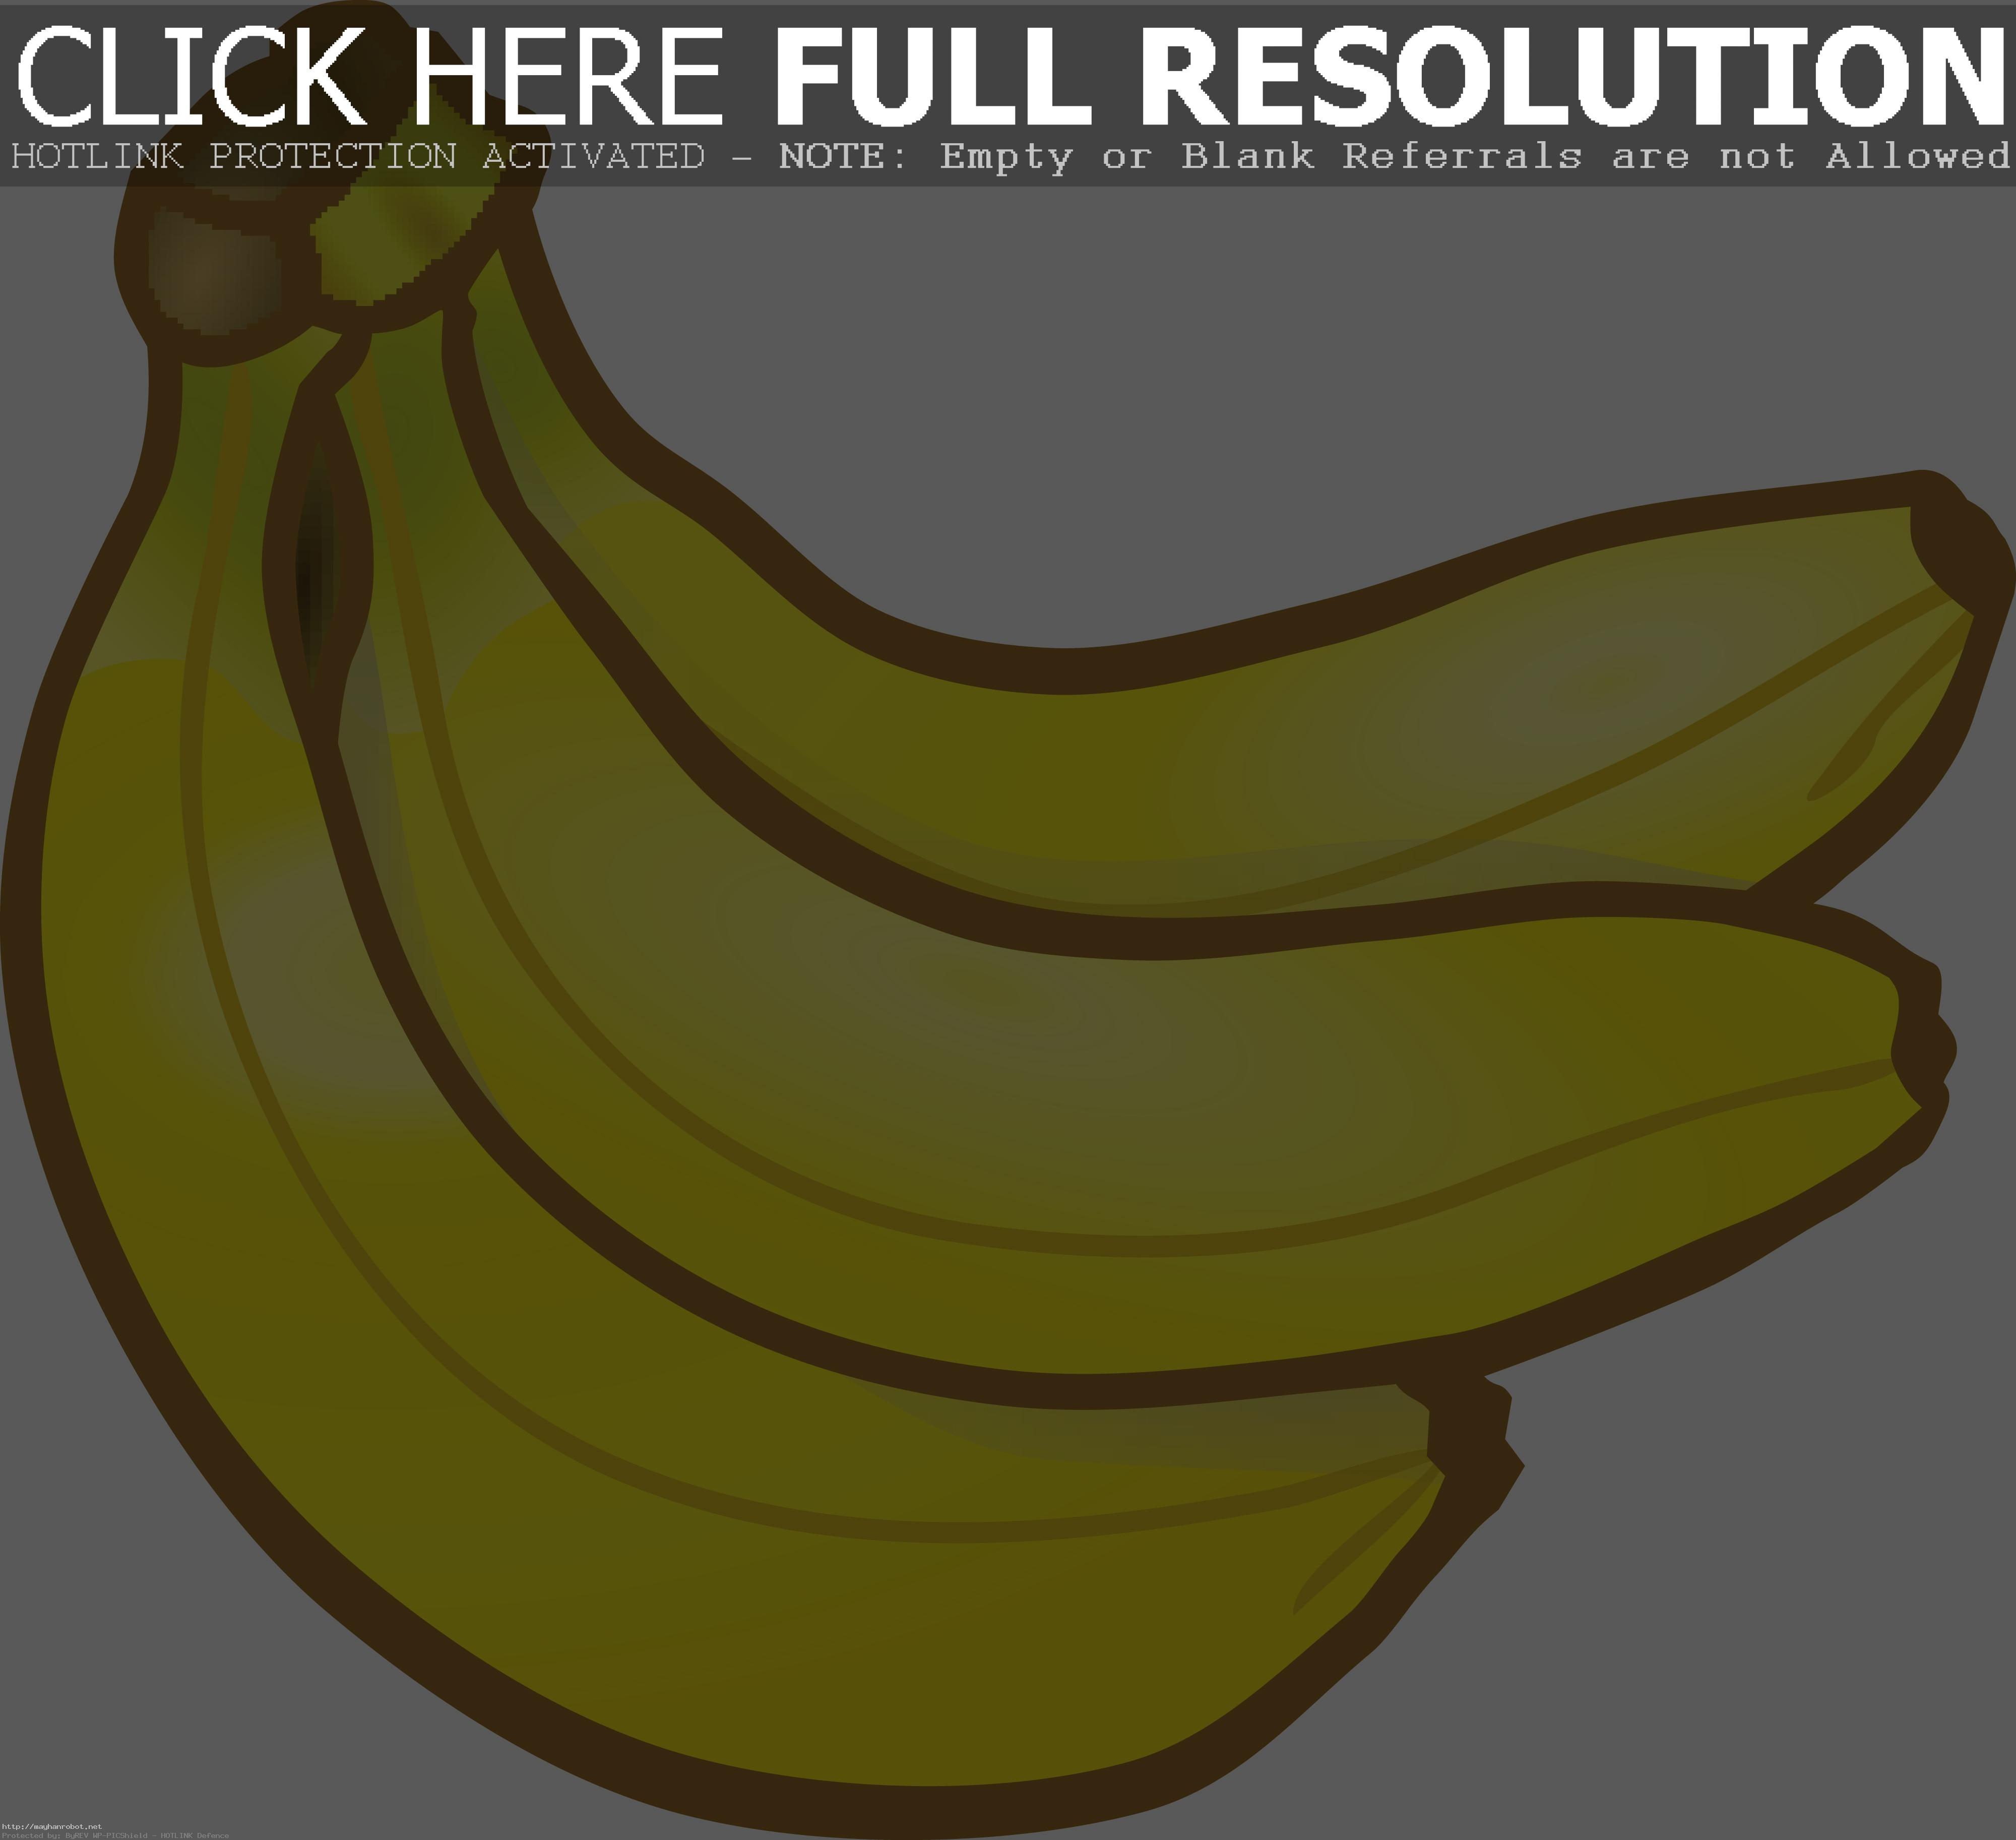 1636 Free Clipart Of A Banana Clip Art-1636 Free Clipart Of A Banana Clip Art-6